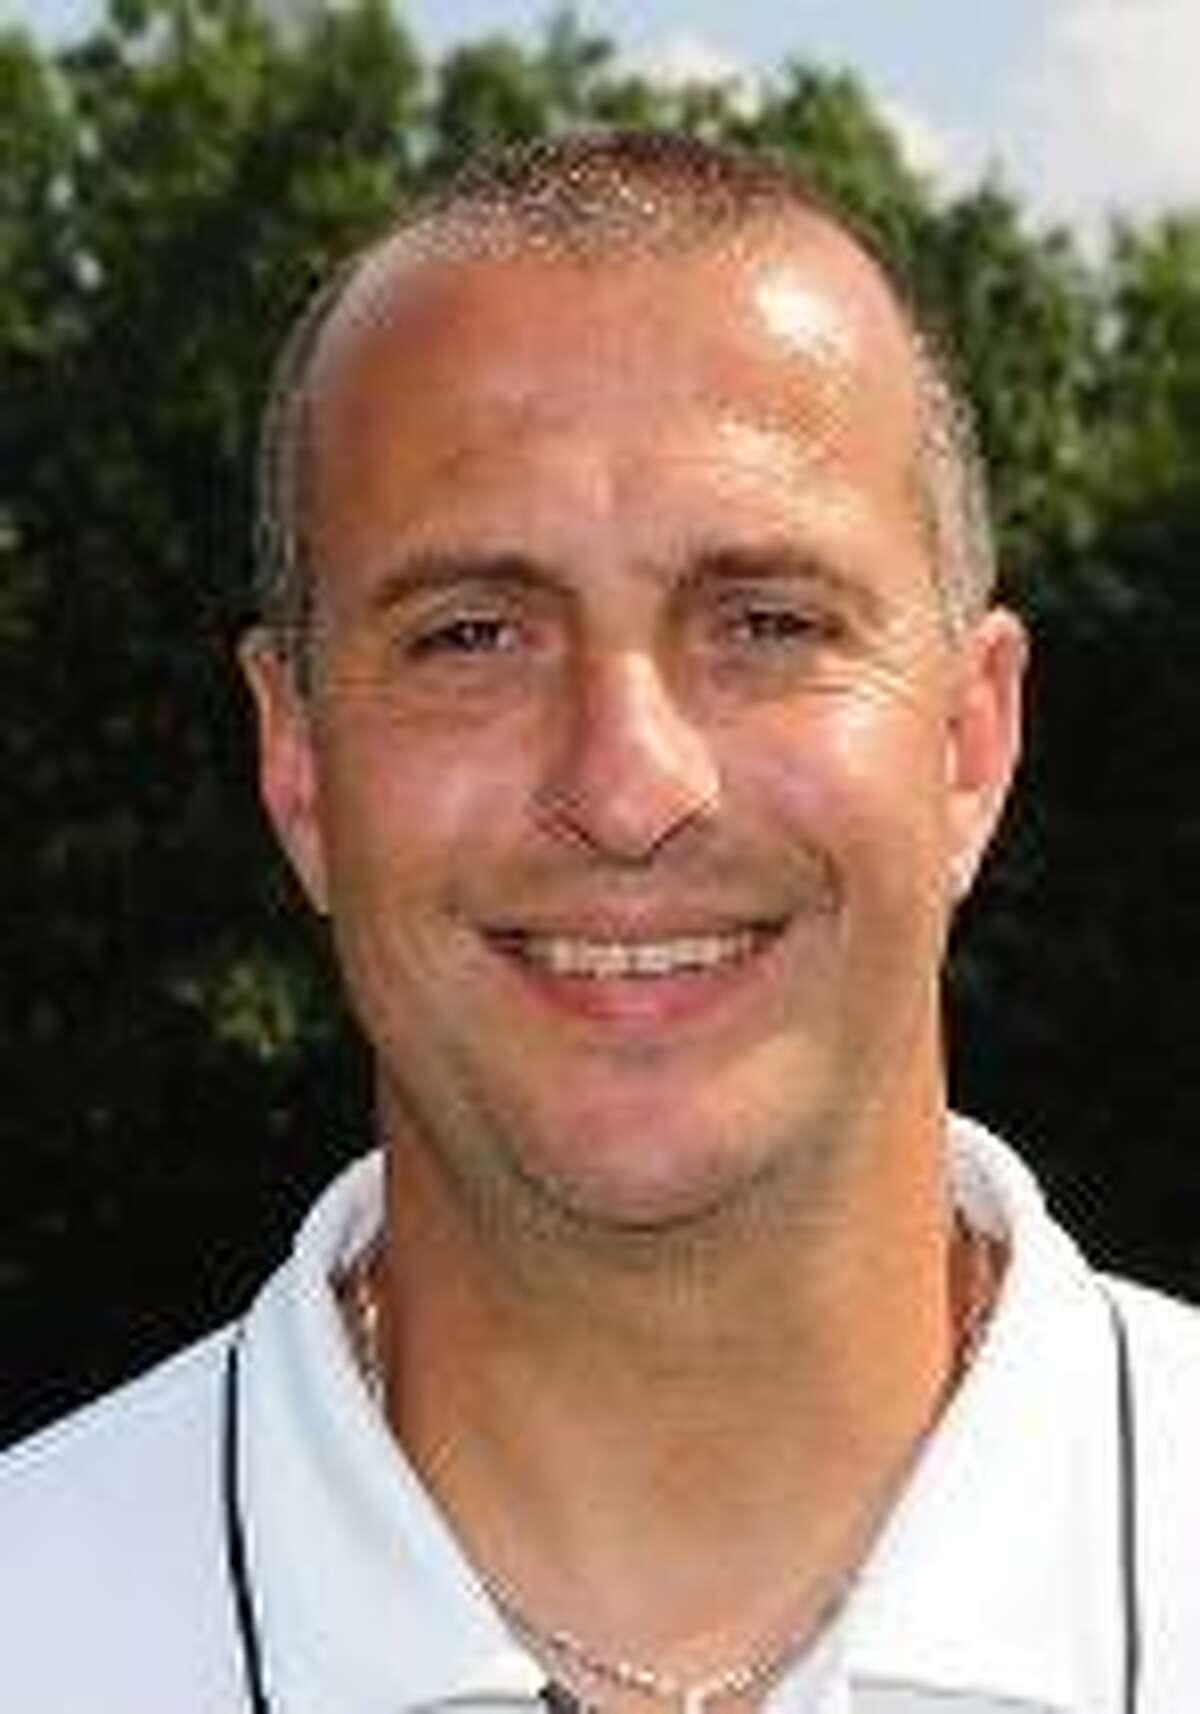 Western Connecticut State University men's soccer coach Joe Mingachos.